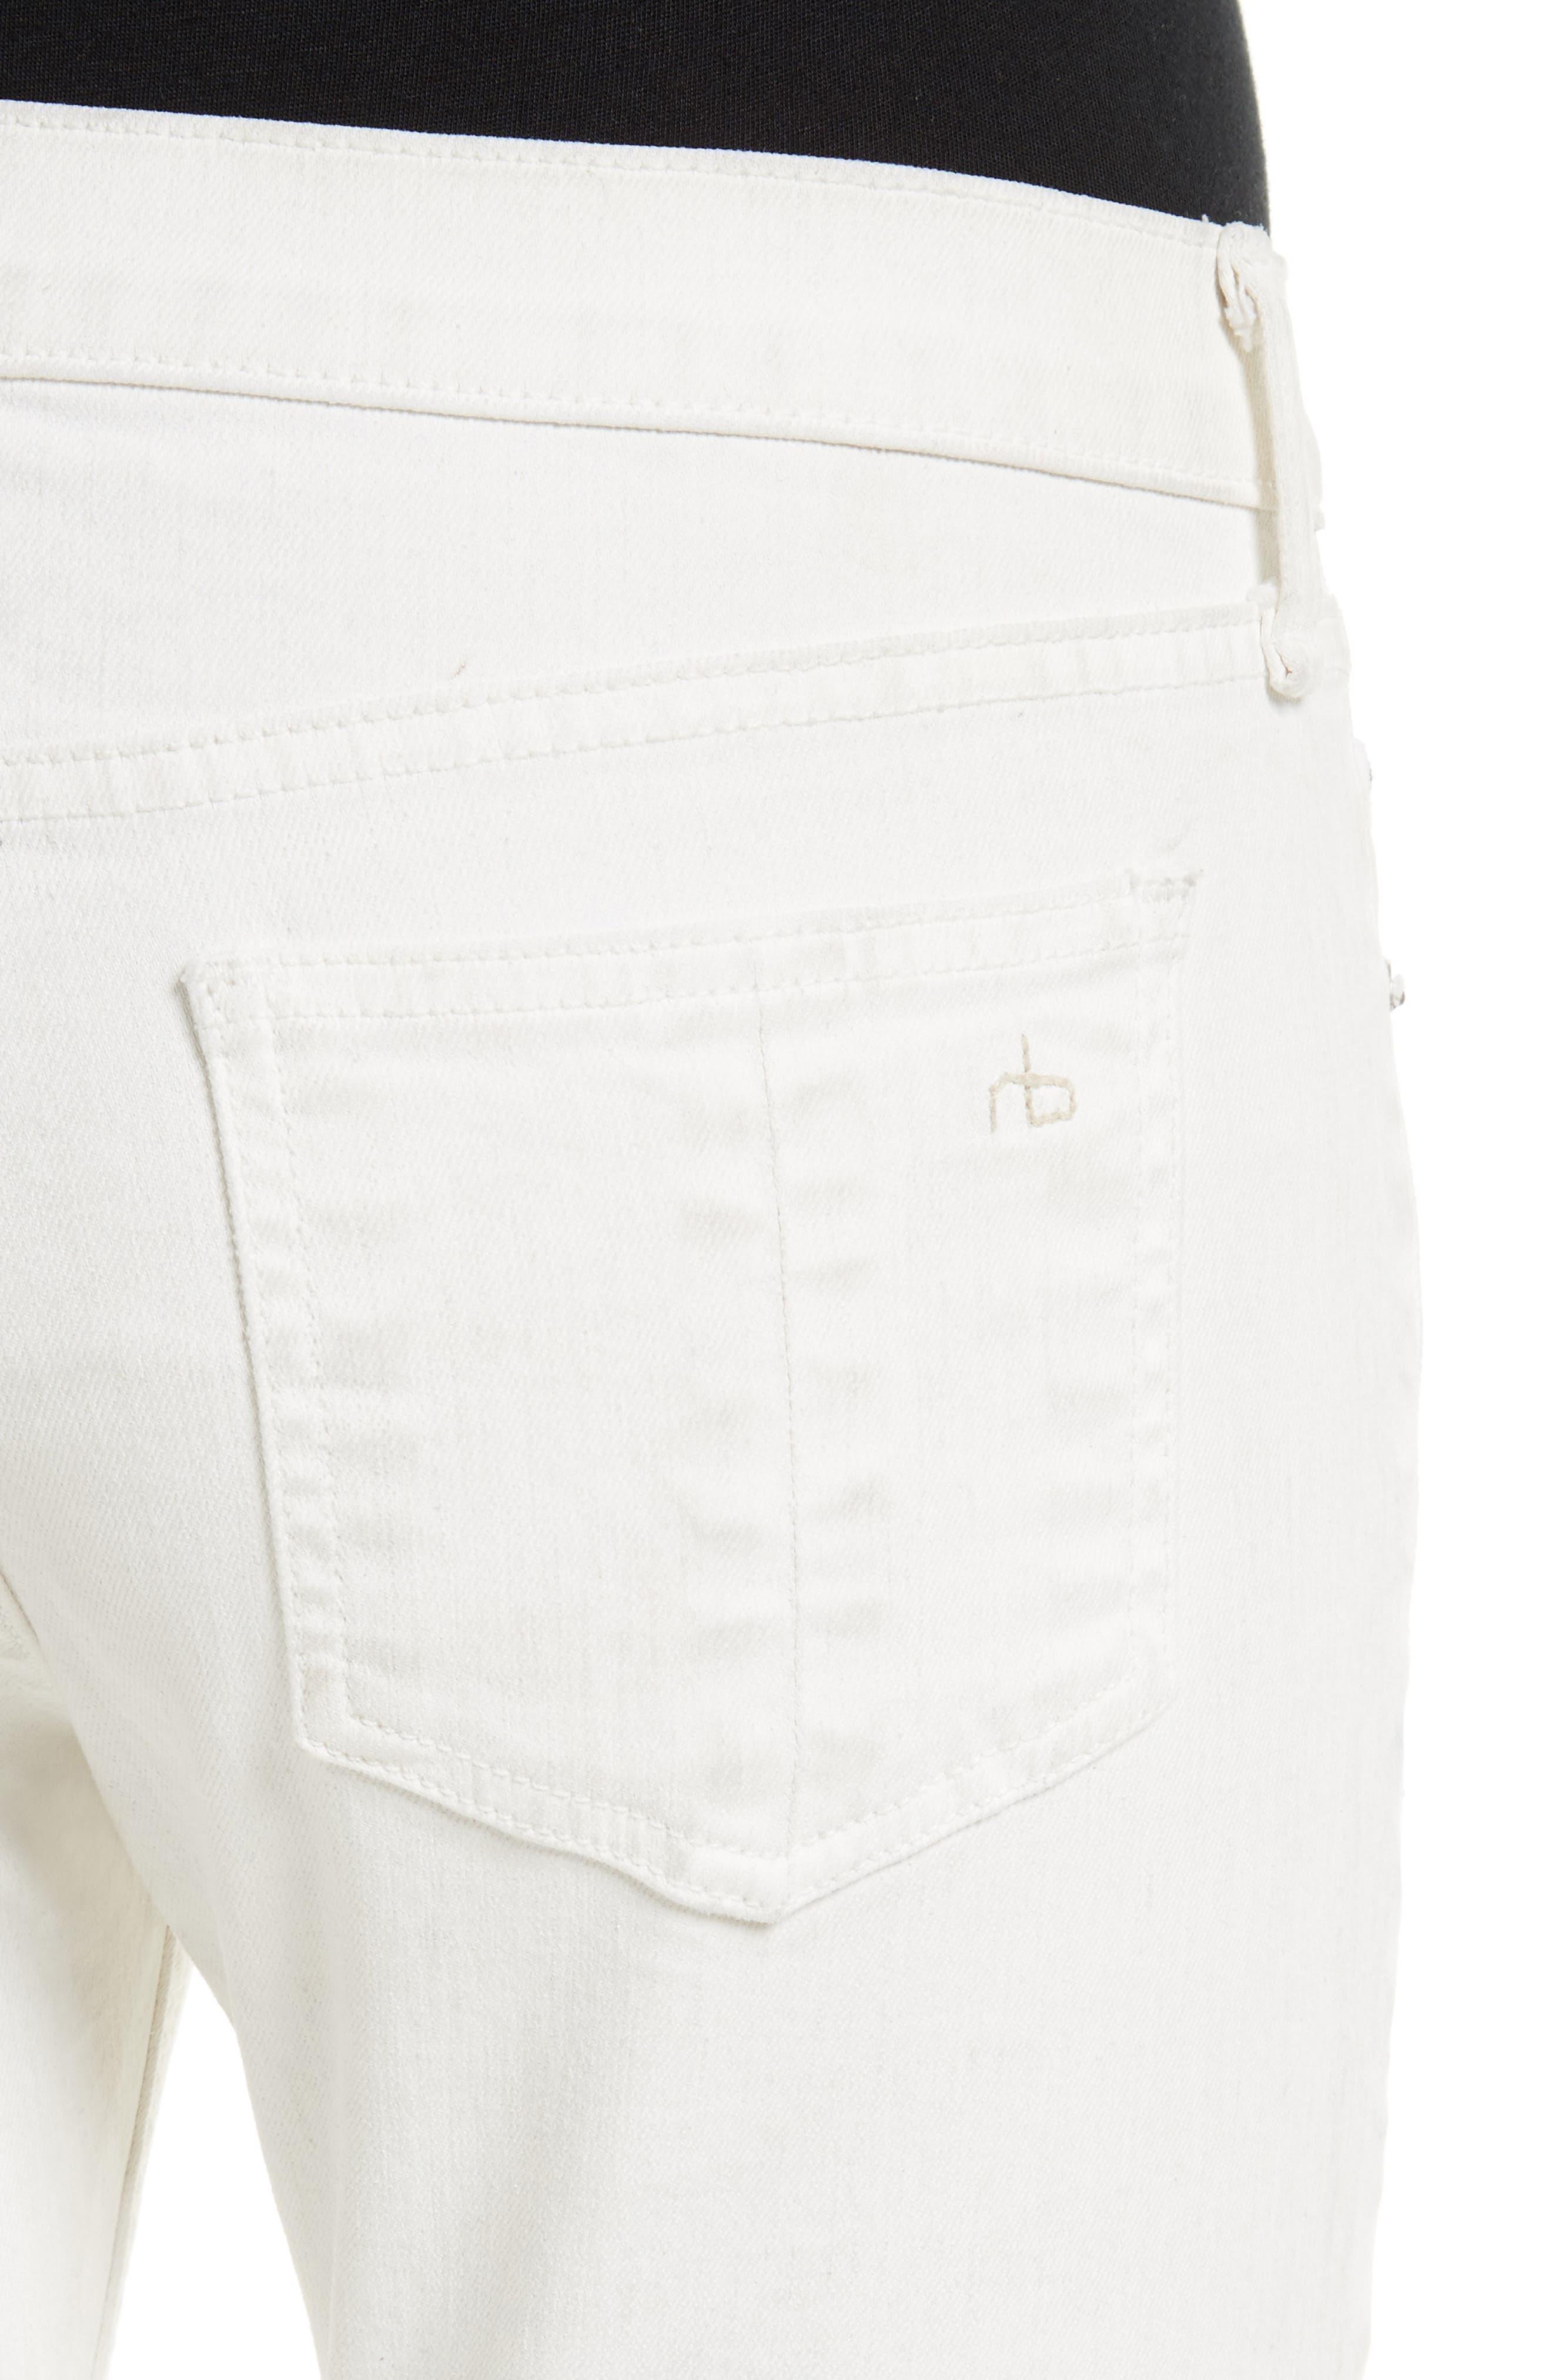 Capri Skinny Jeans,                             Alternate thumbnail 4, color,                             100